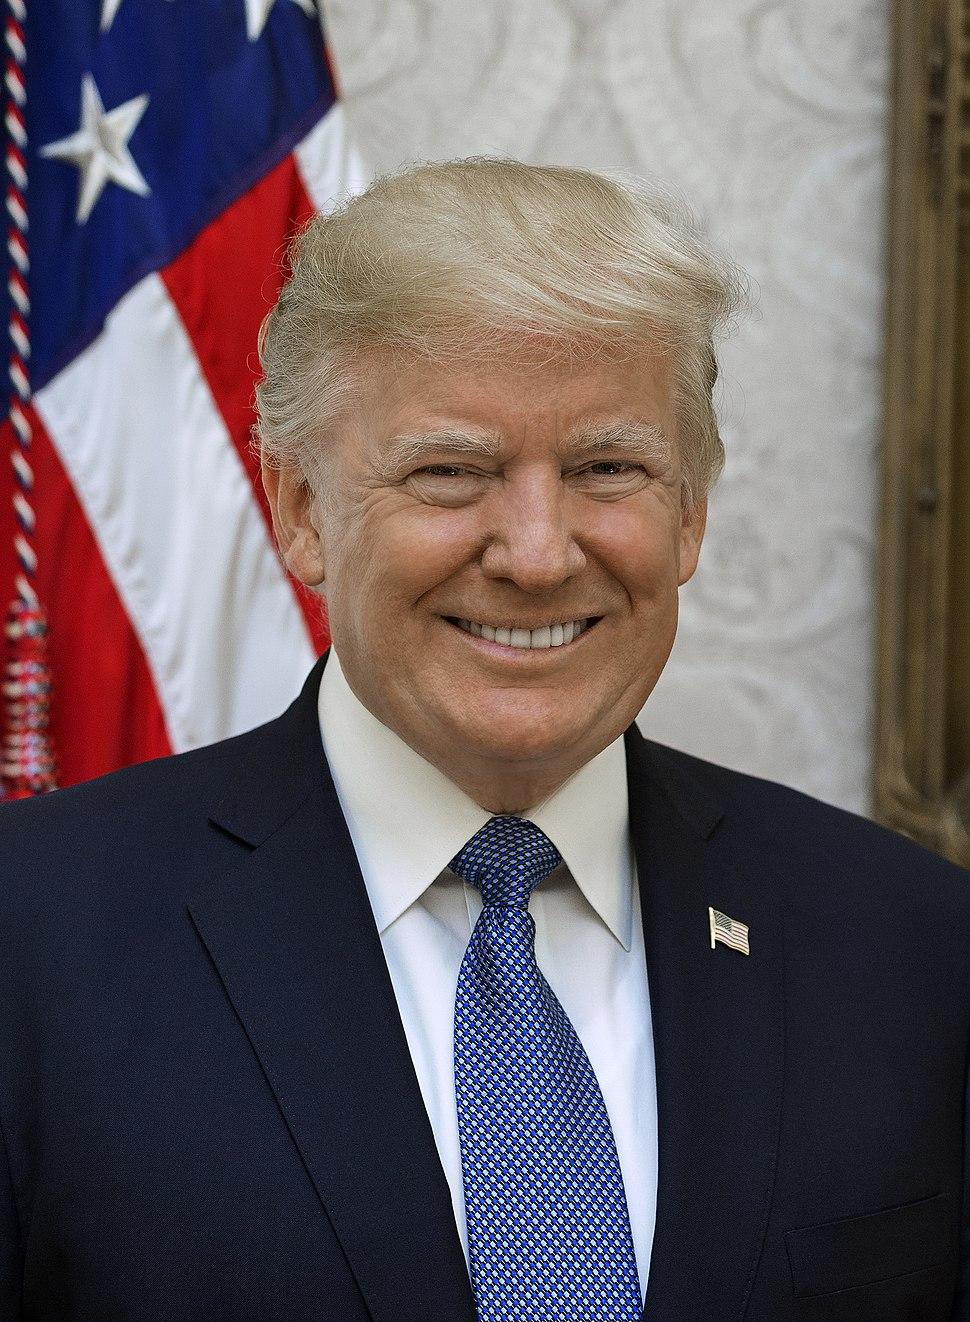 Donald Trump official portrait (cropped 2)